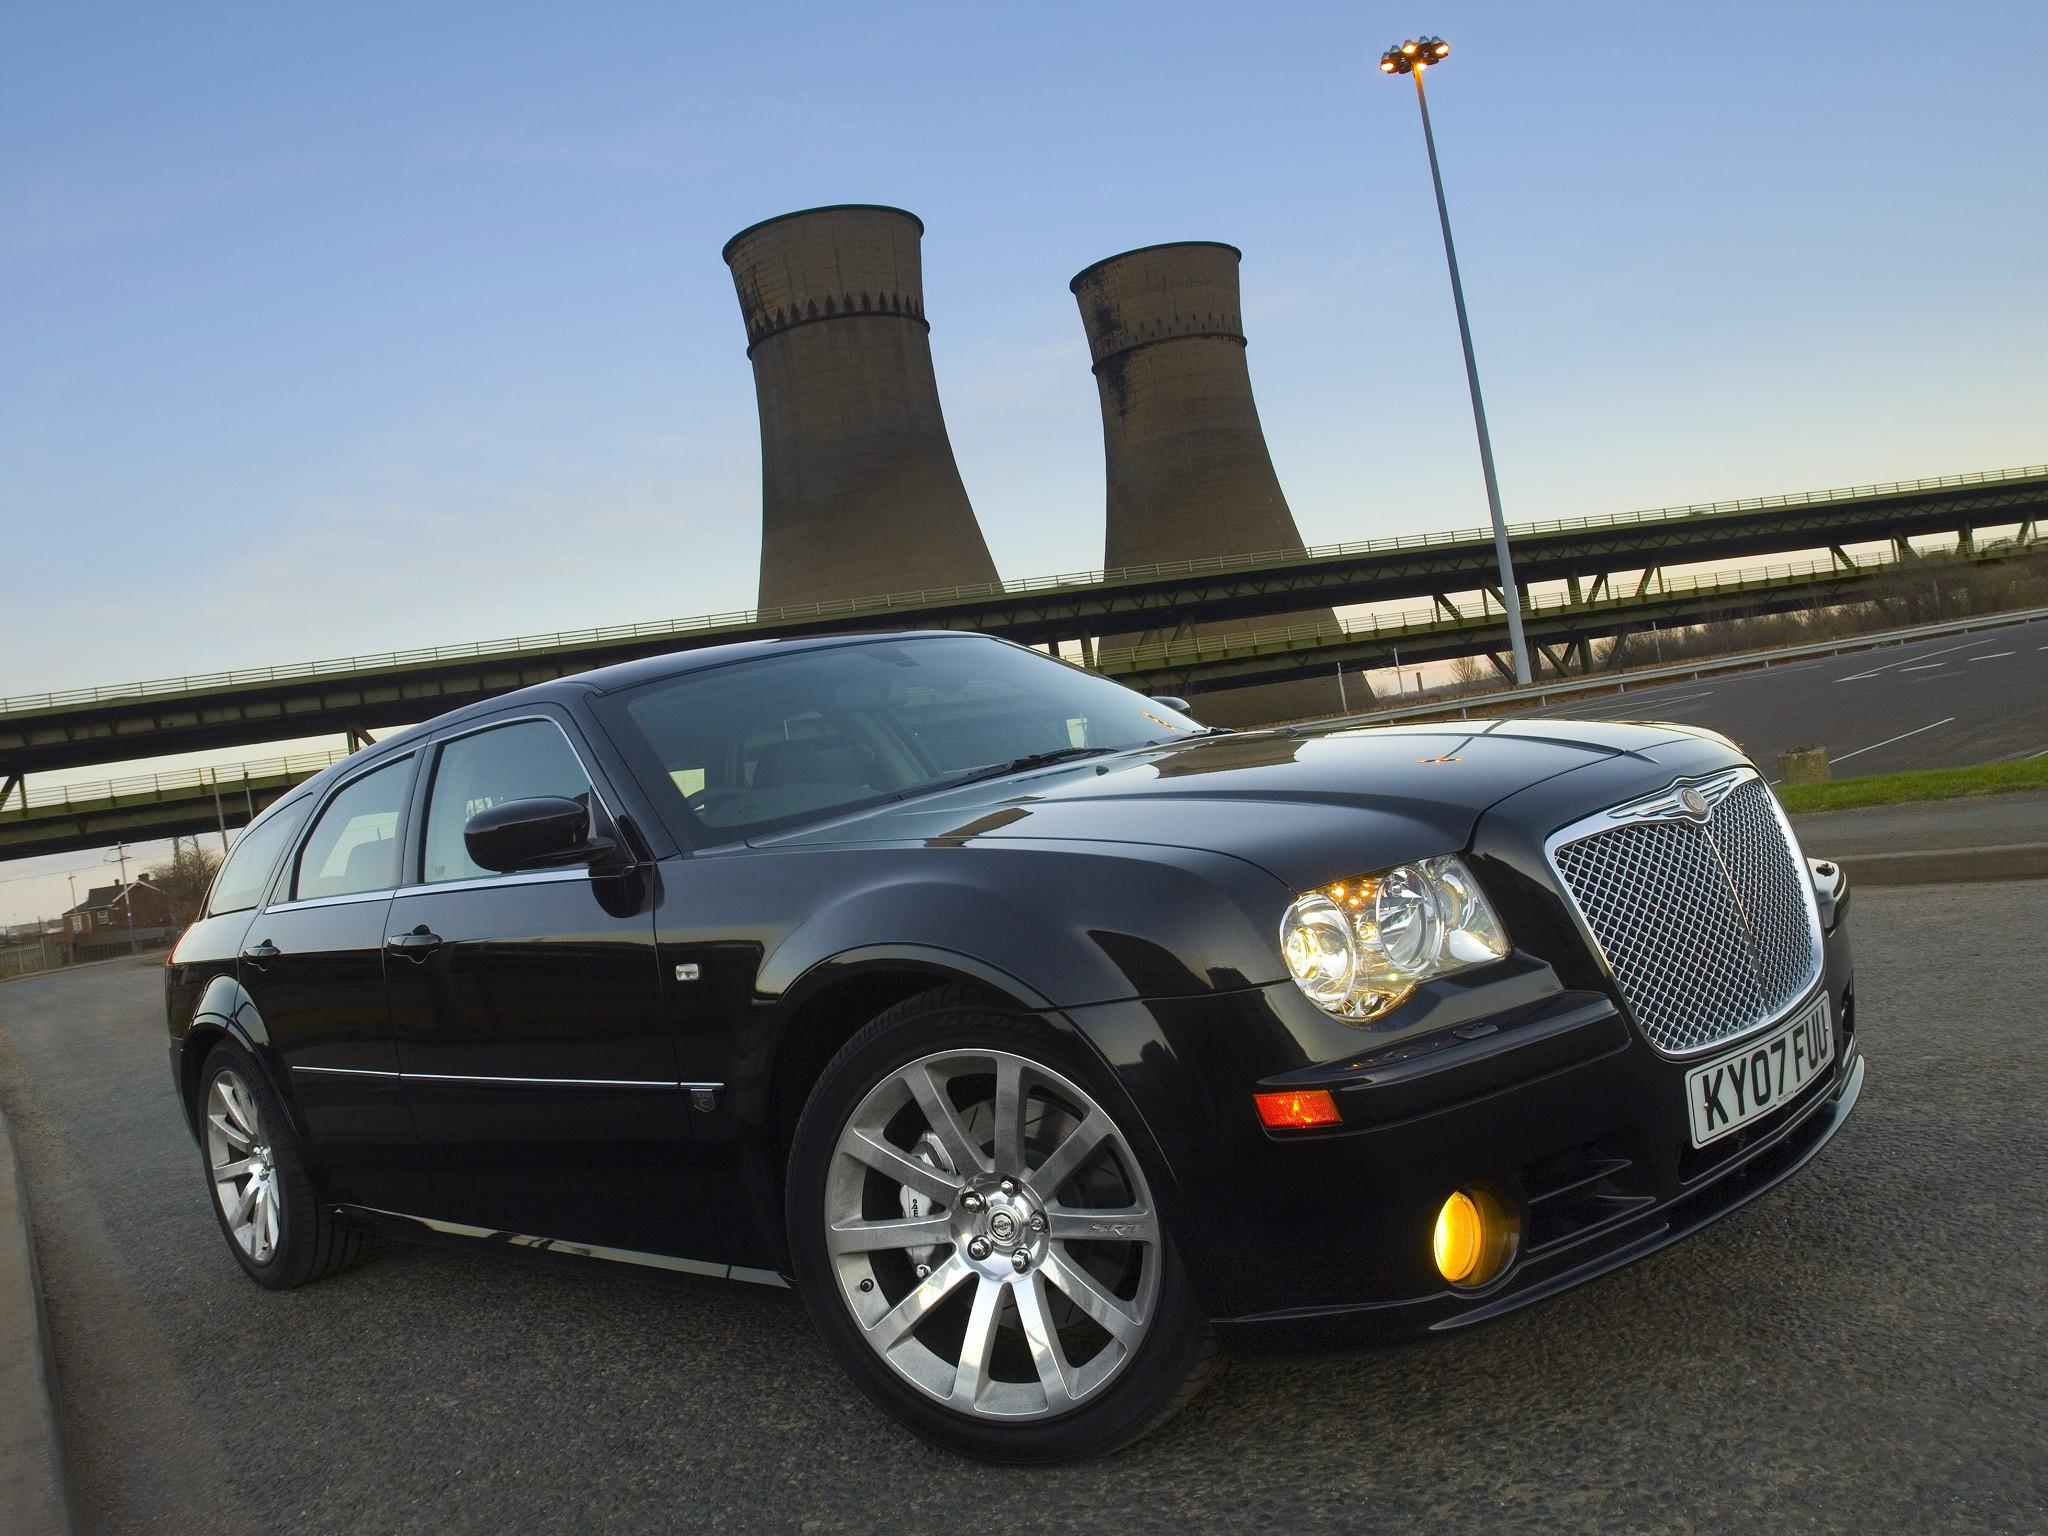 chrysler 300 rear spoilers chrysler 300 car accessories. Black Bedroom Furniture Sets. Home Design Ideas